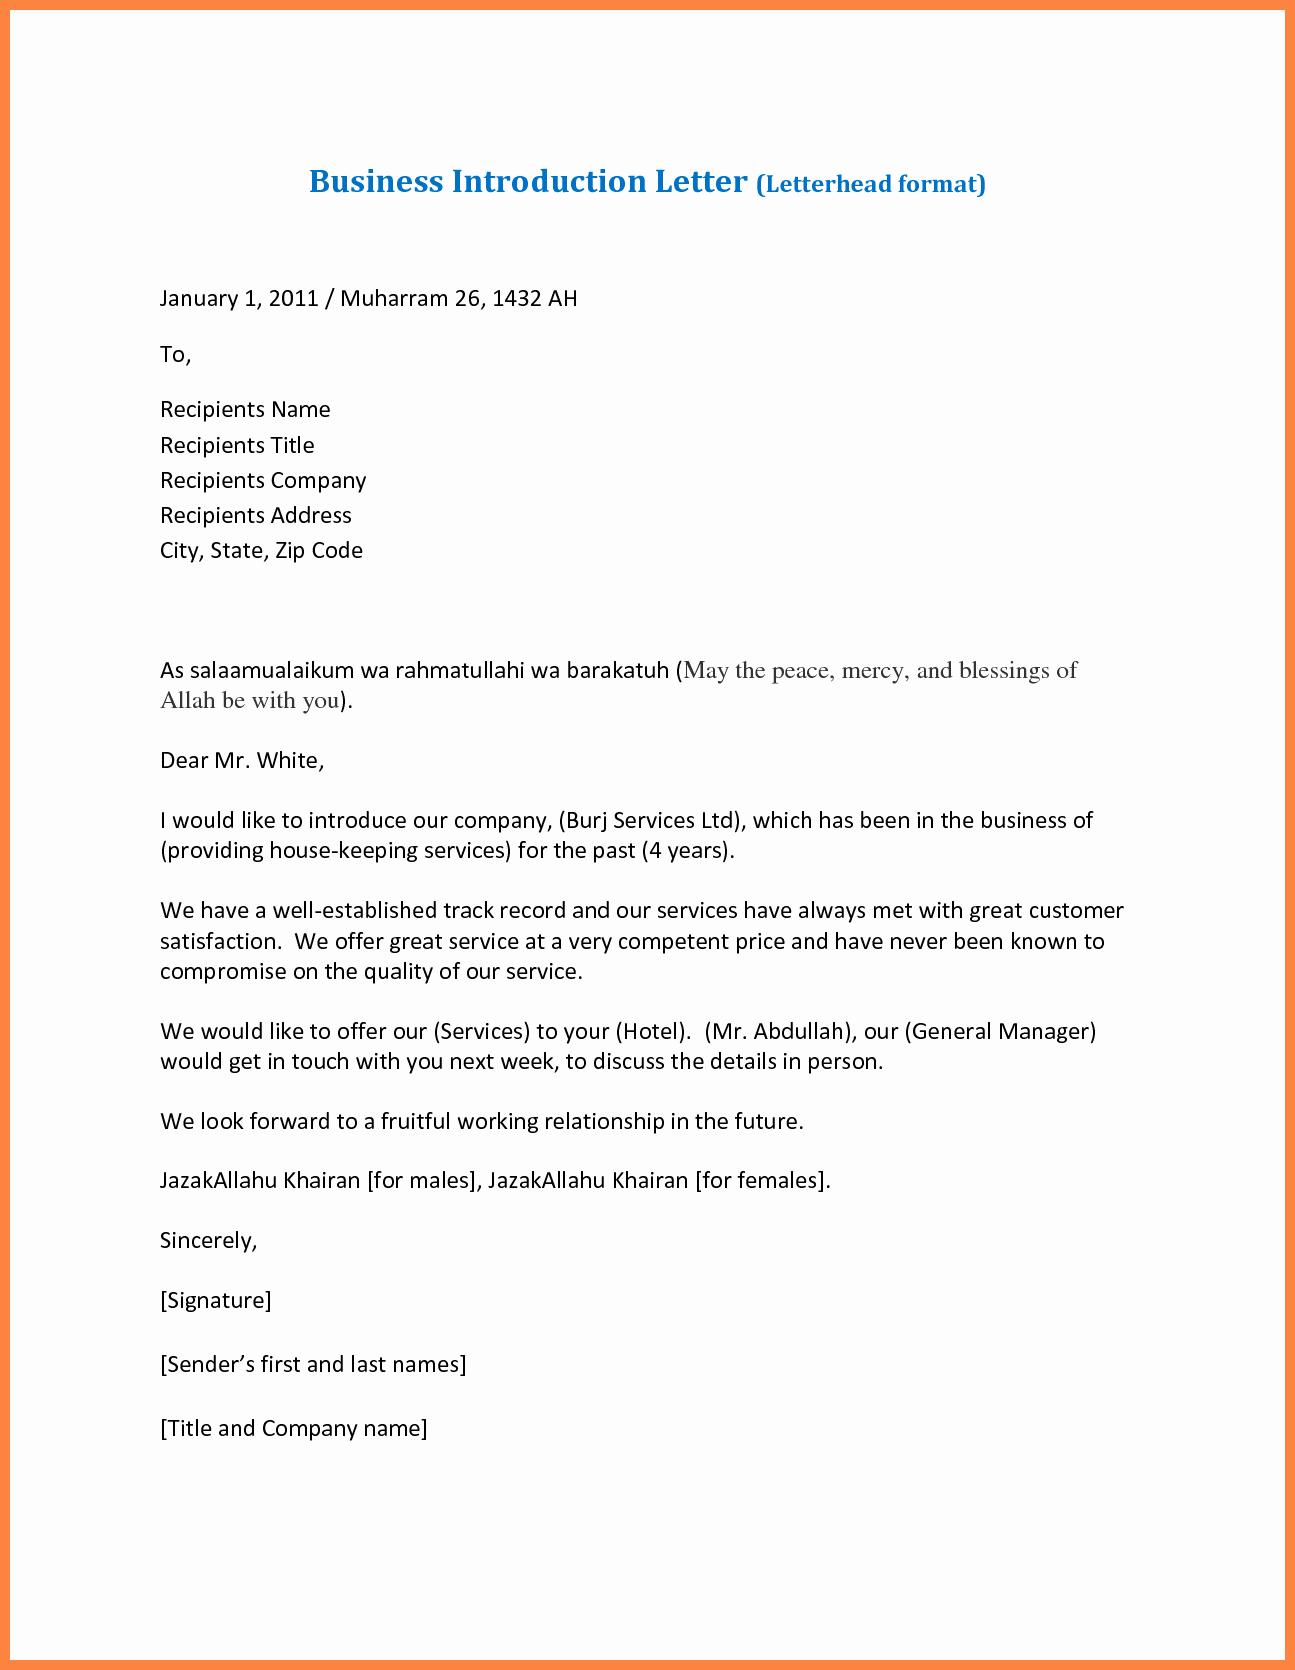 Sample Business Letter On Letterhead Inspirational 7 Pany Business Introduction Letter Sample